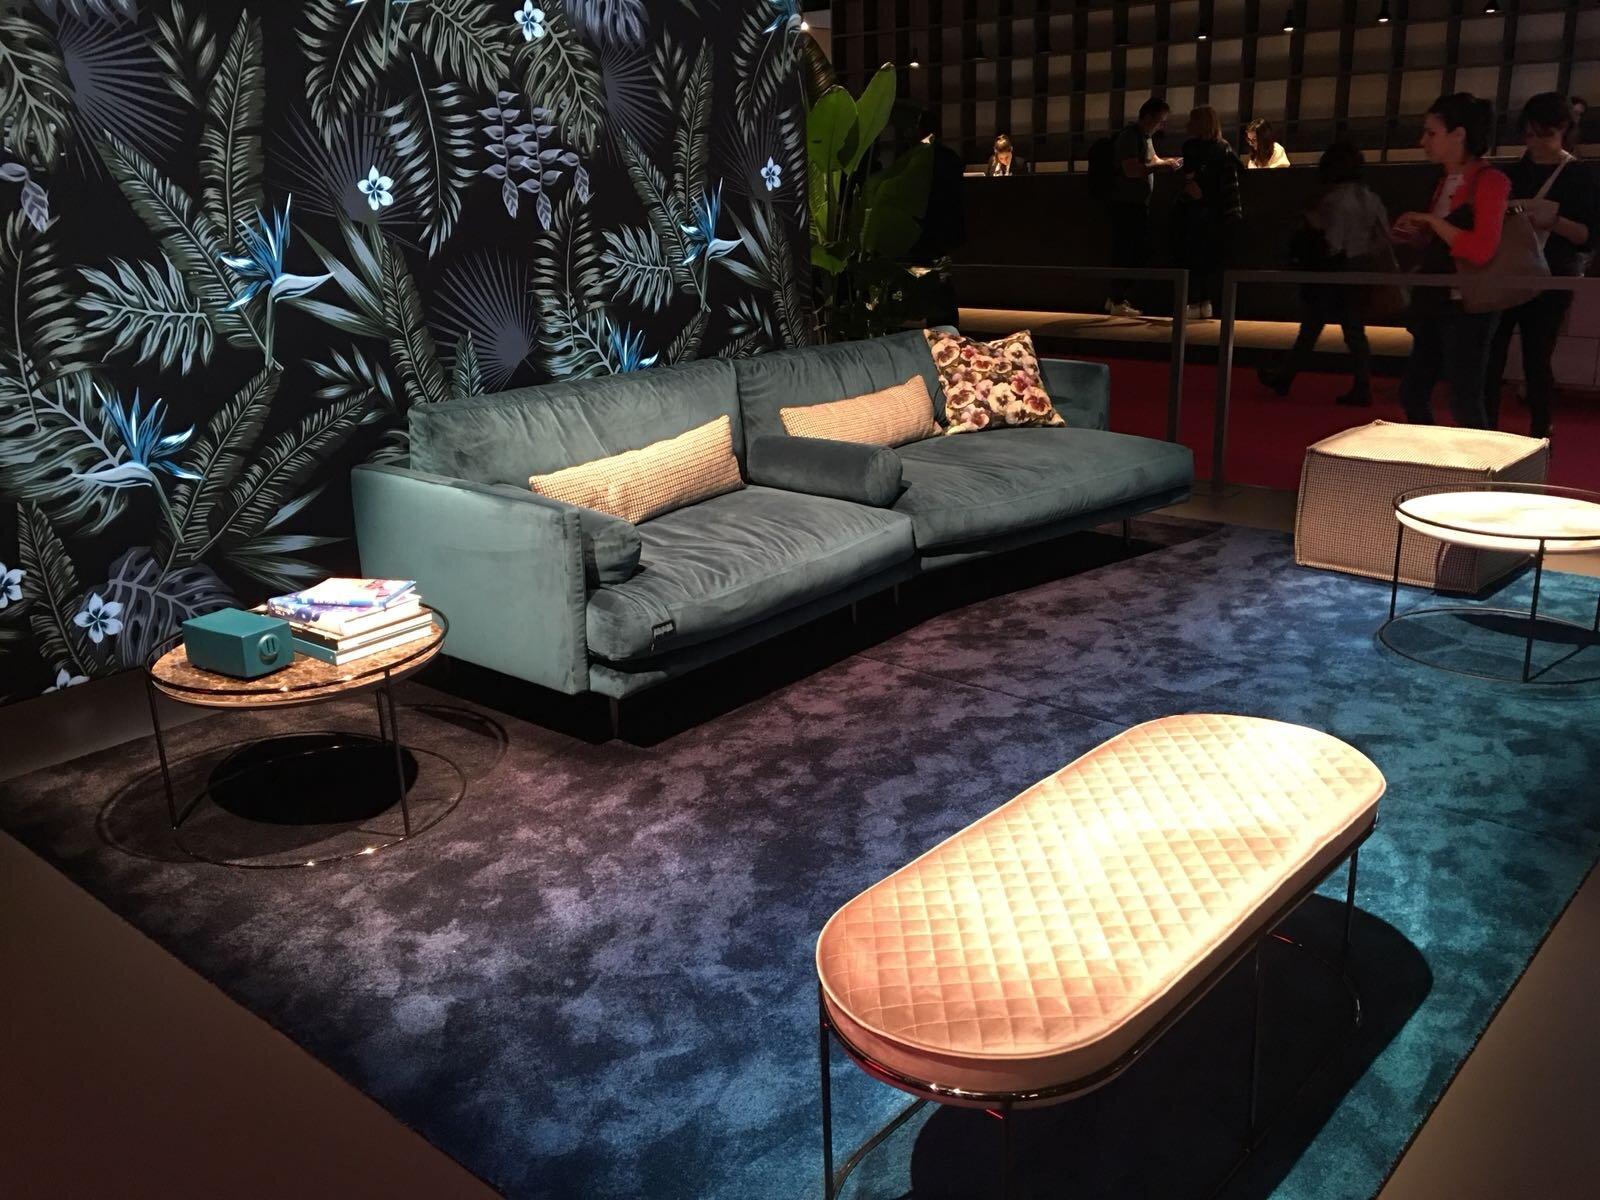 Calligaris Petite Furniture.JPG